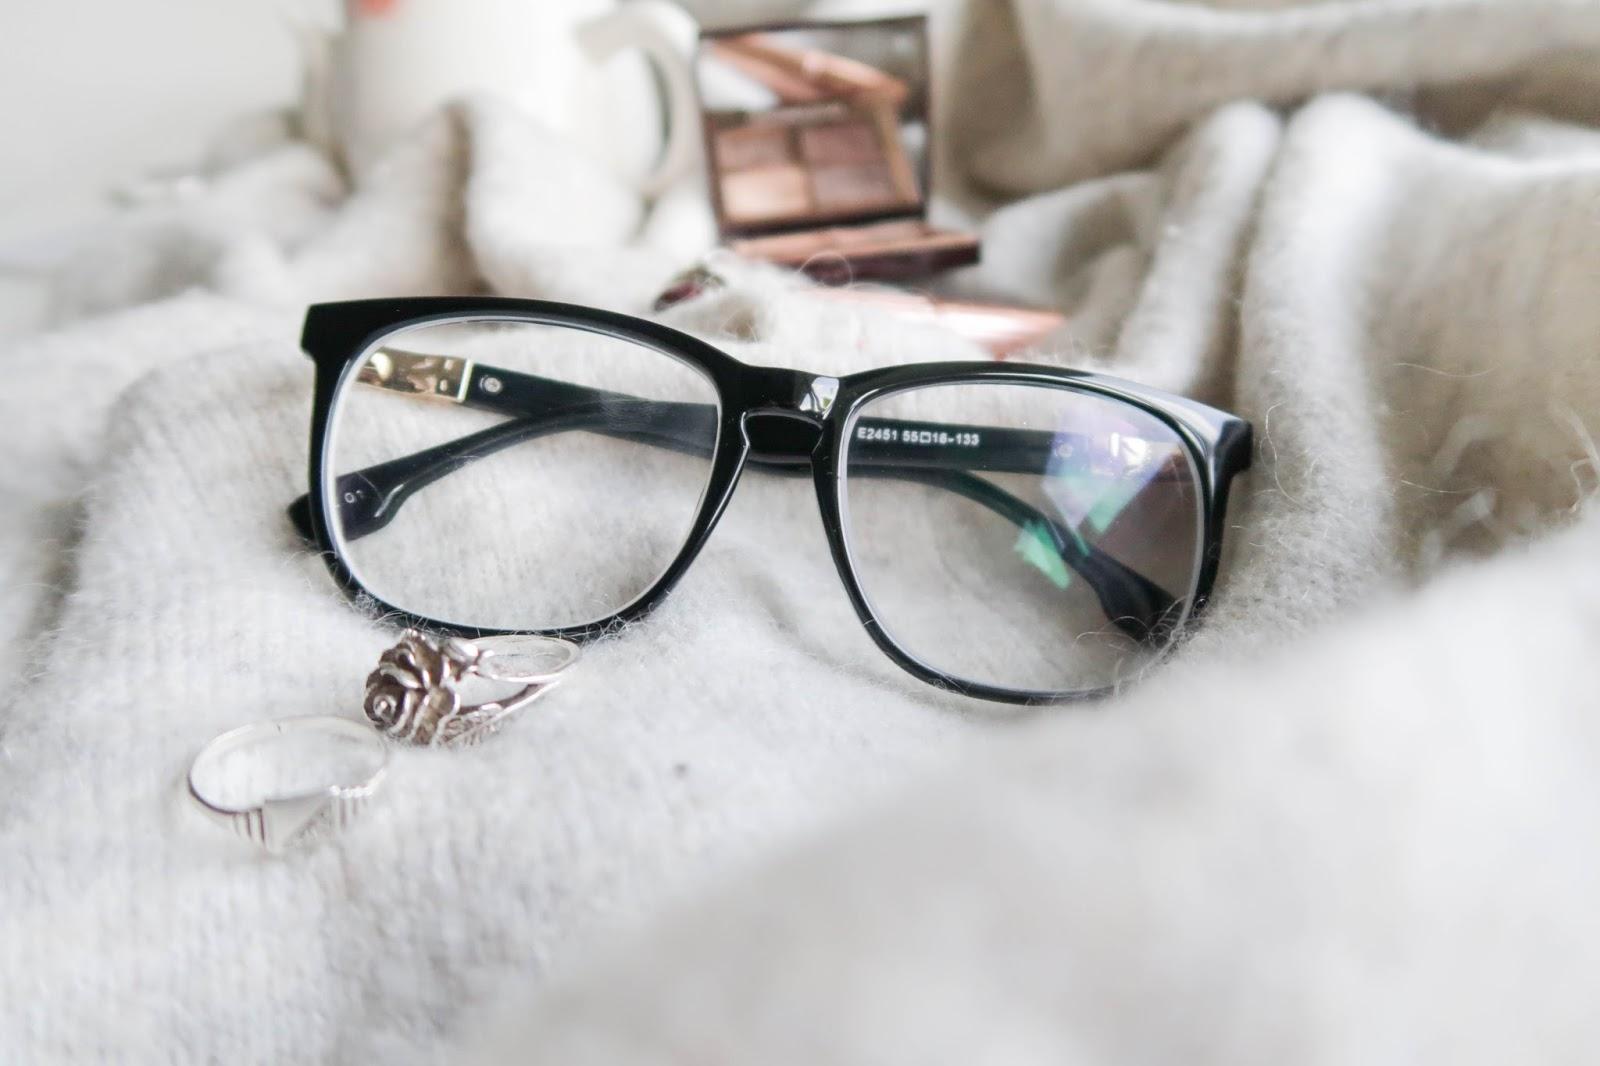 Glassesshop review